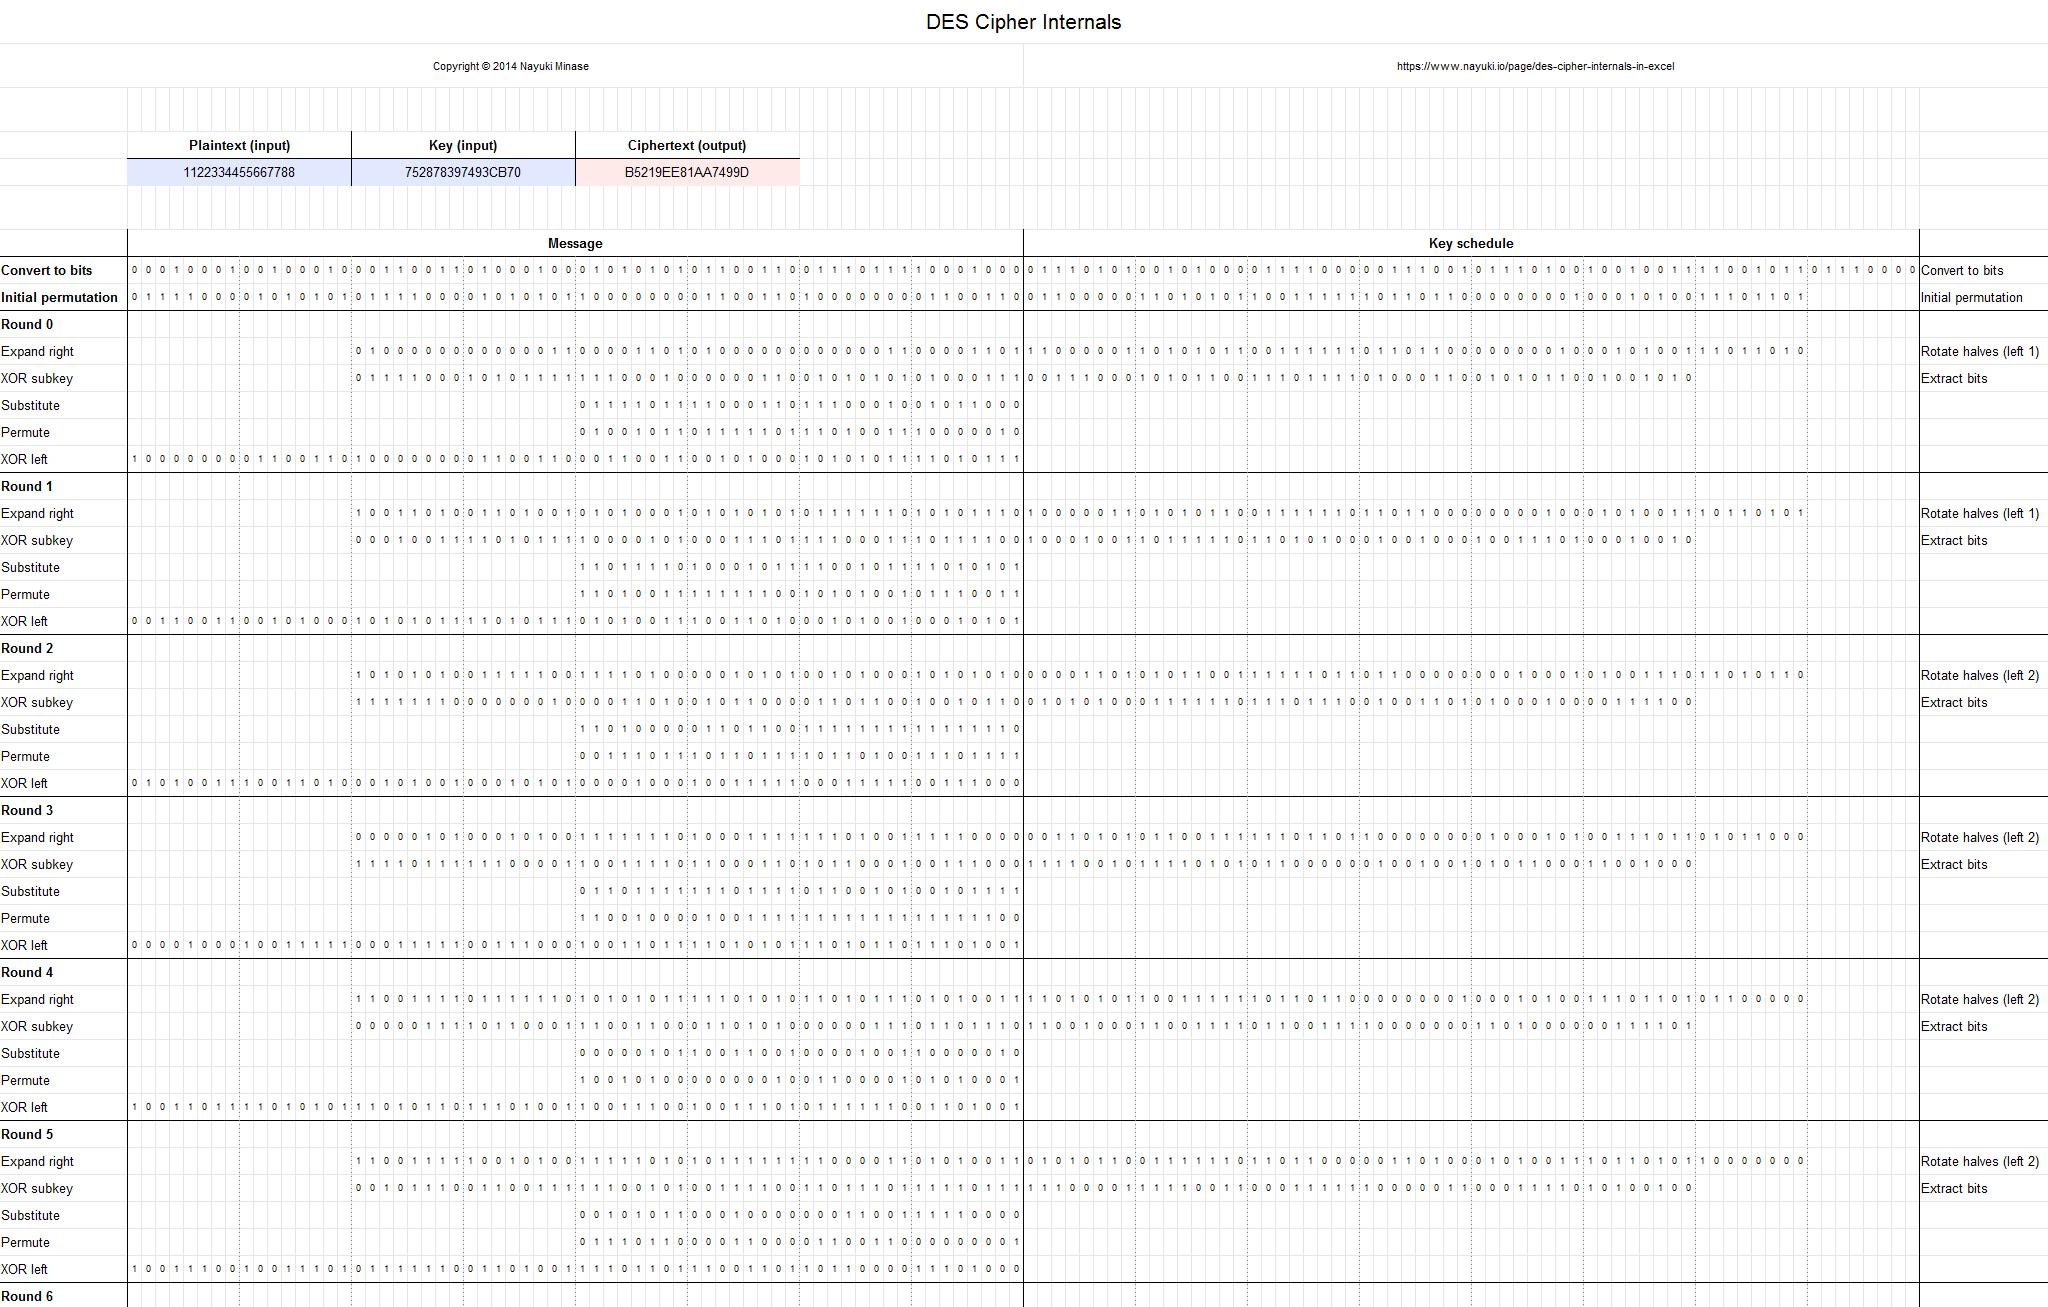 DES cipher internals in Excel